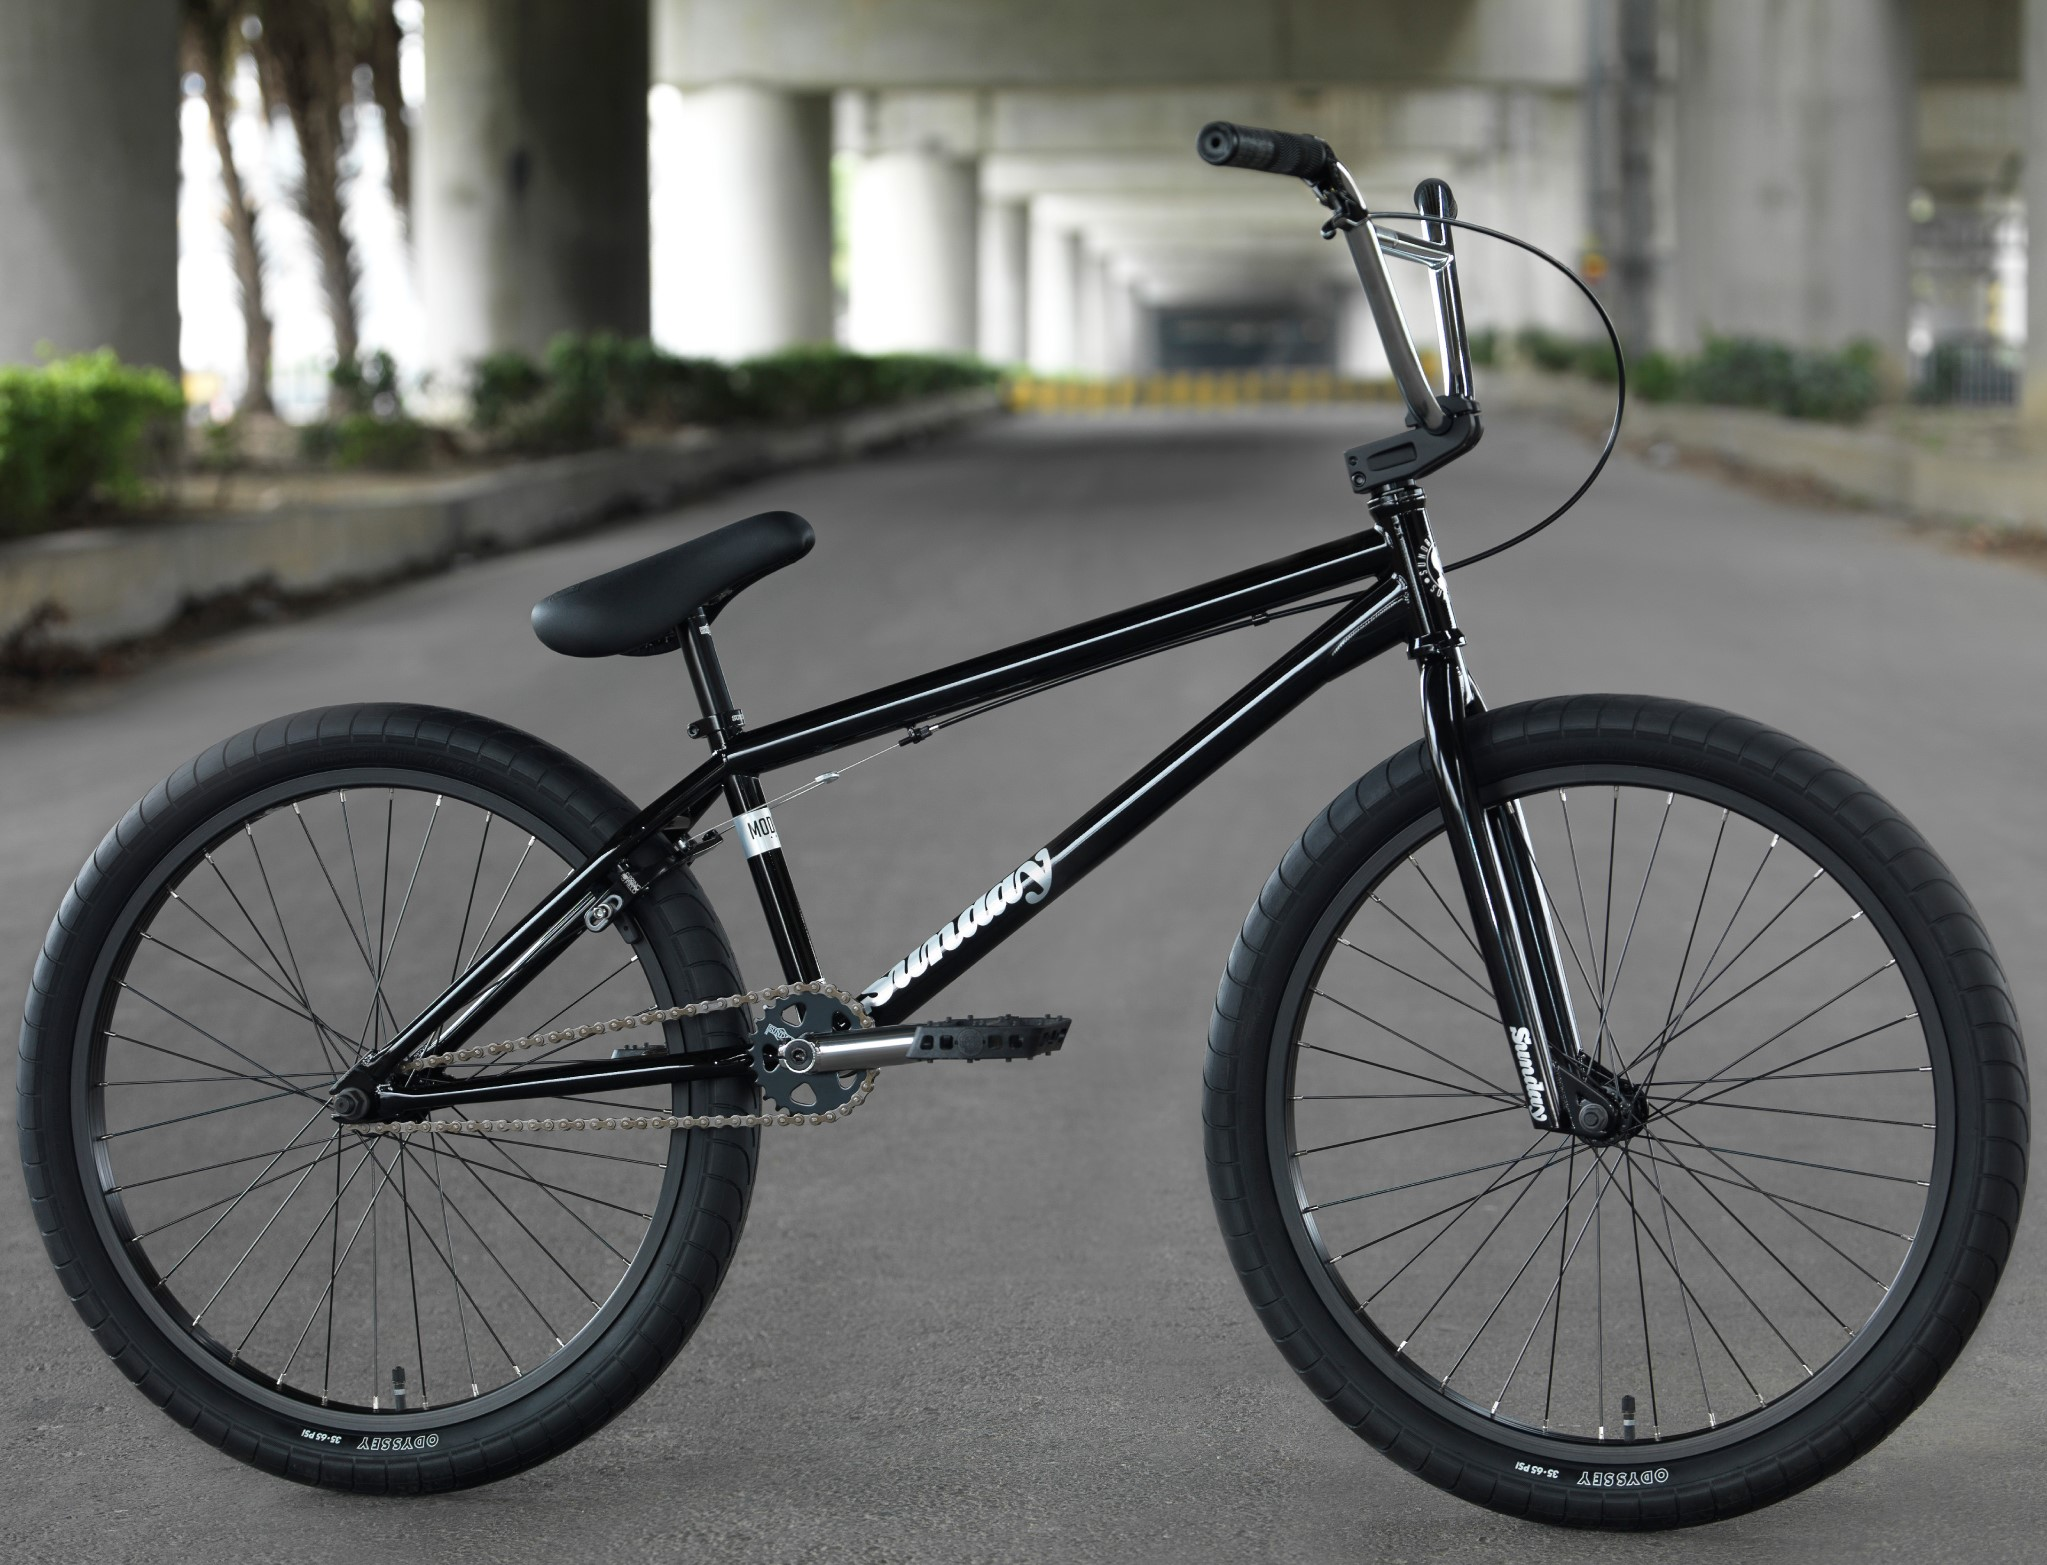 bmx-cruiser-bike-sunday-model-c-black-2018.jpg